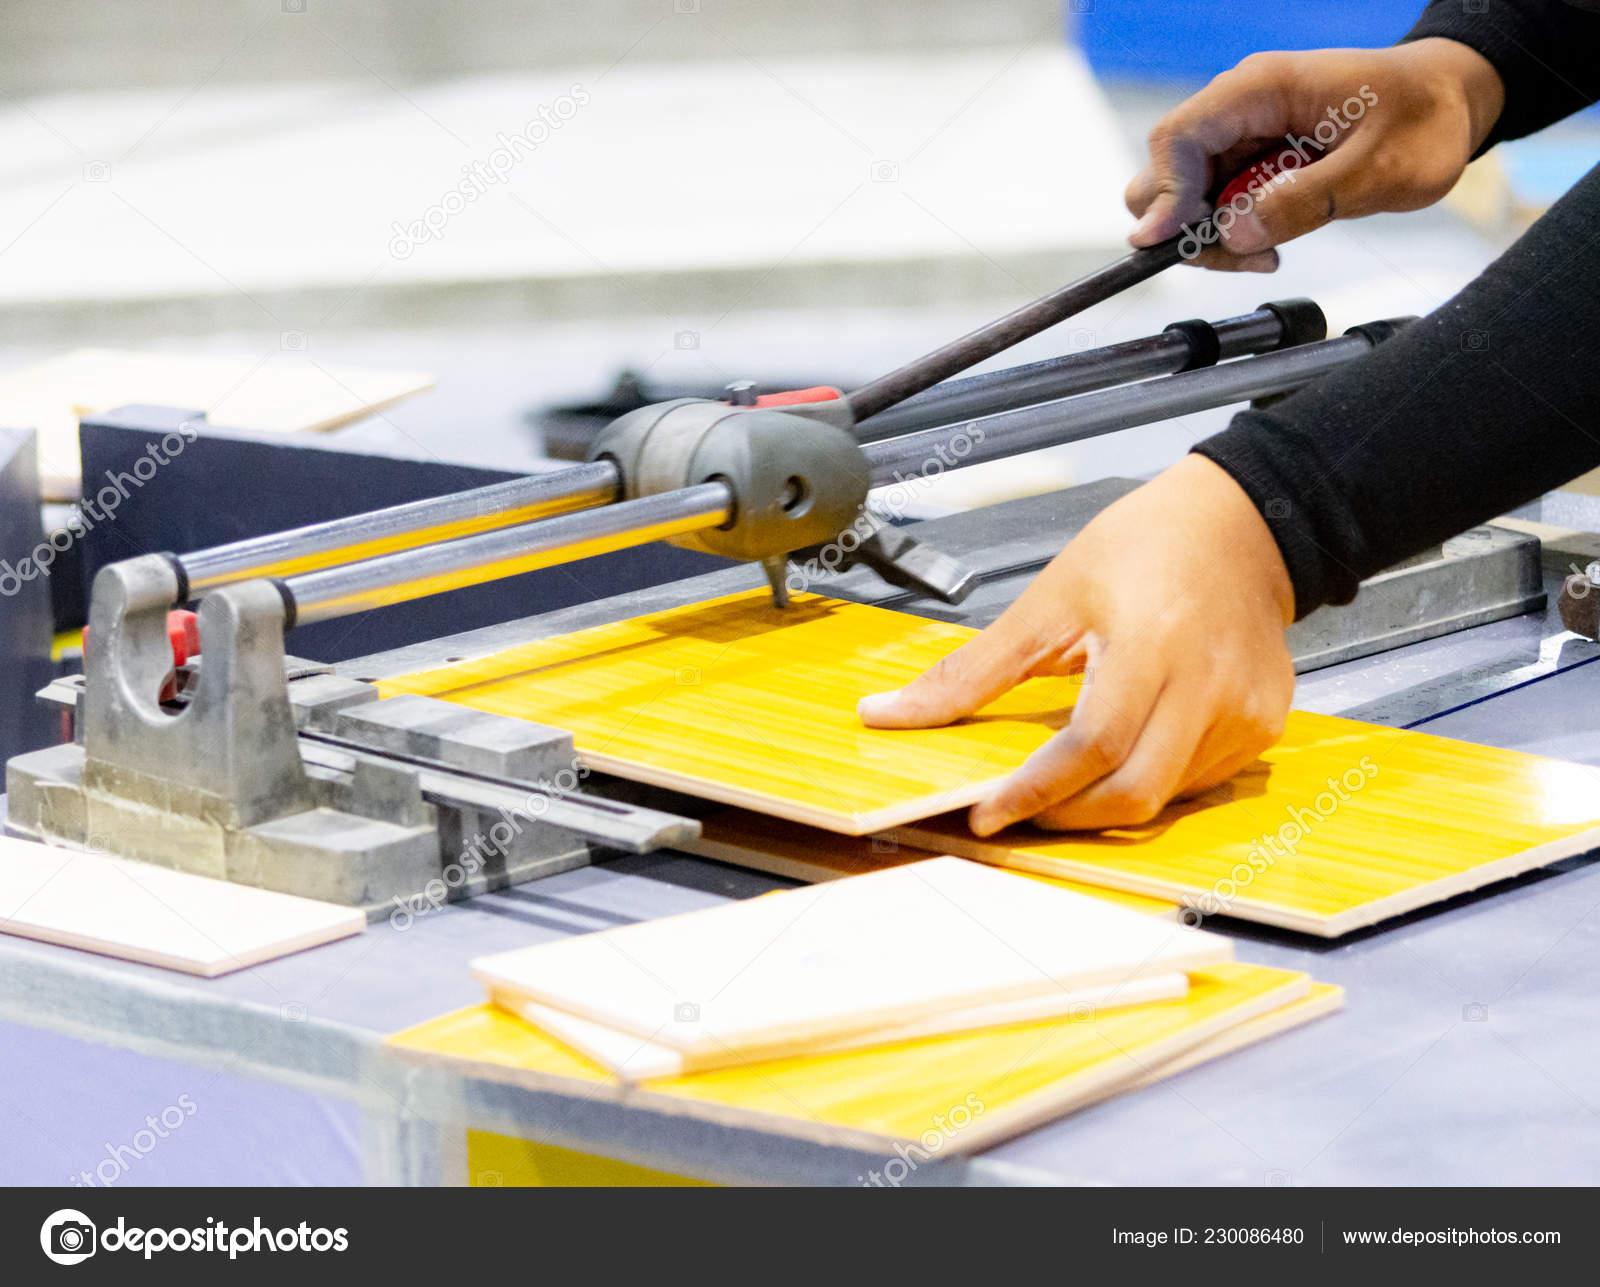 cutting floor tiles using tile cutter machine cutting ceramic tiles stock photo image by c prarinya 230086480